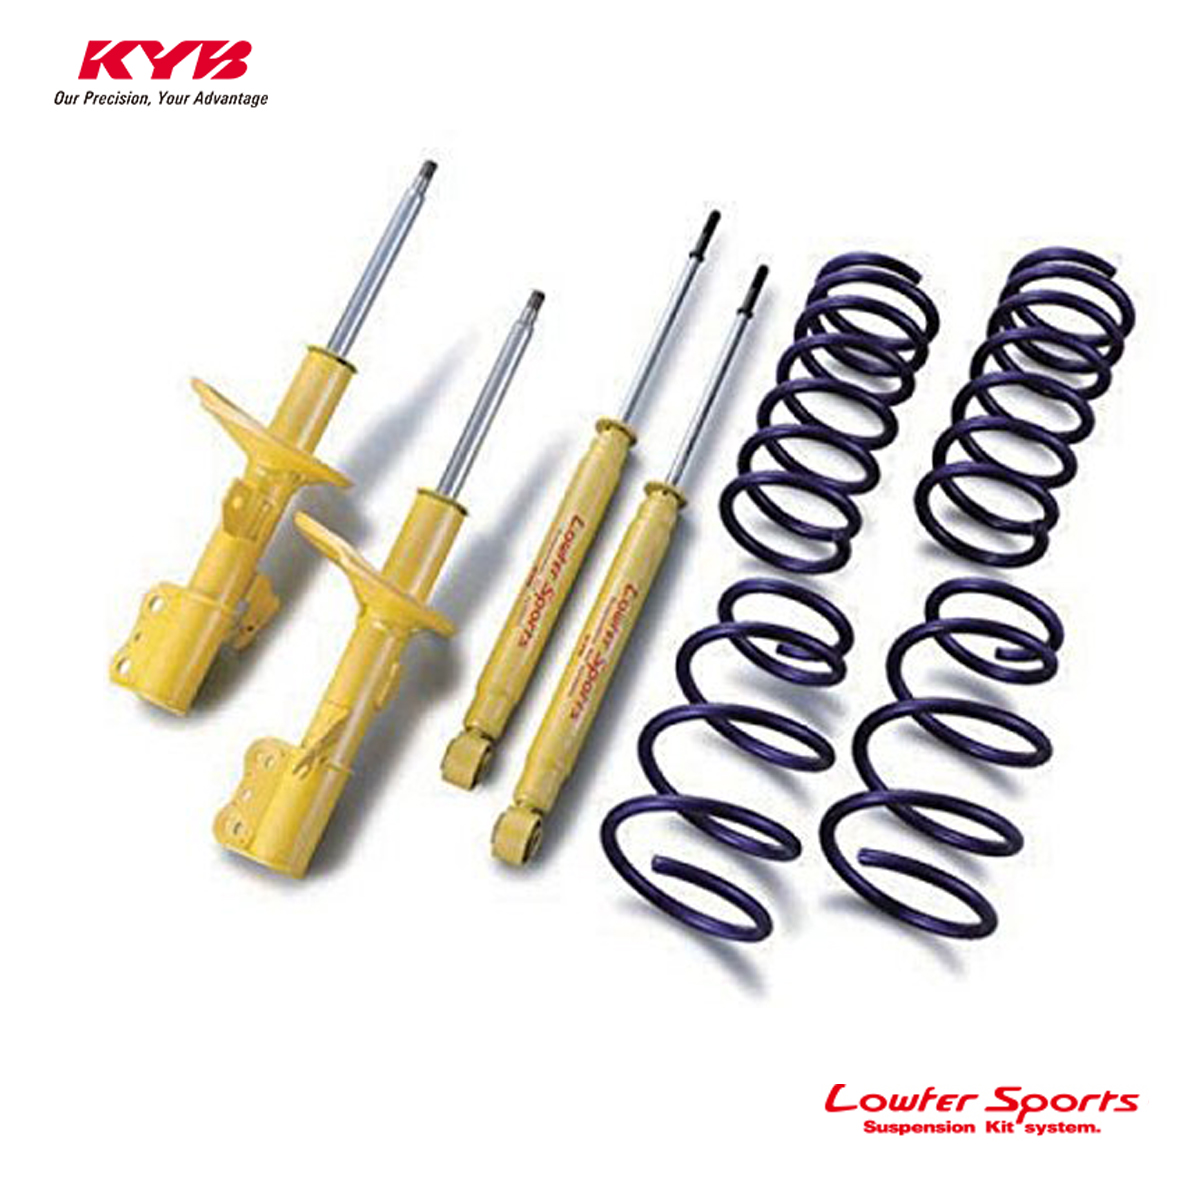 KYB カヤバ カローラフィルダー ZZE123G ショックアブソーバー サスペンションキット Lowfer Sports LKIT-ZZE123G 配送先条件有り